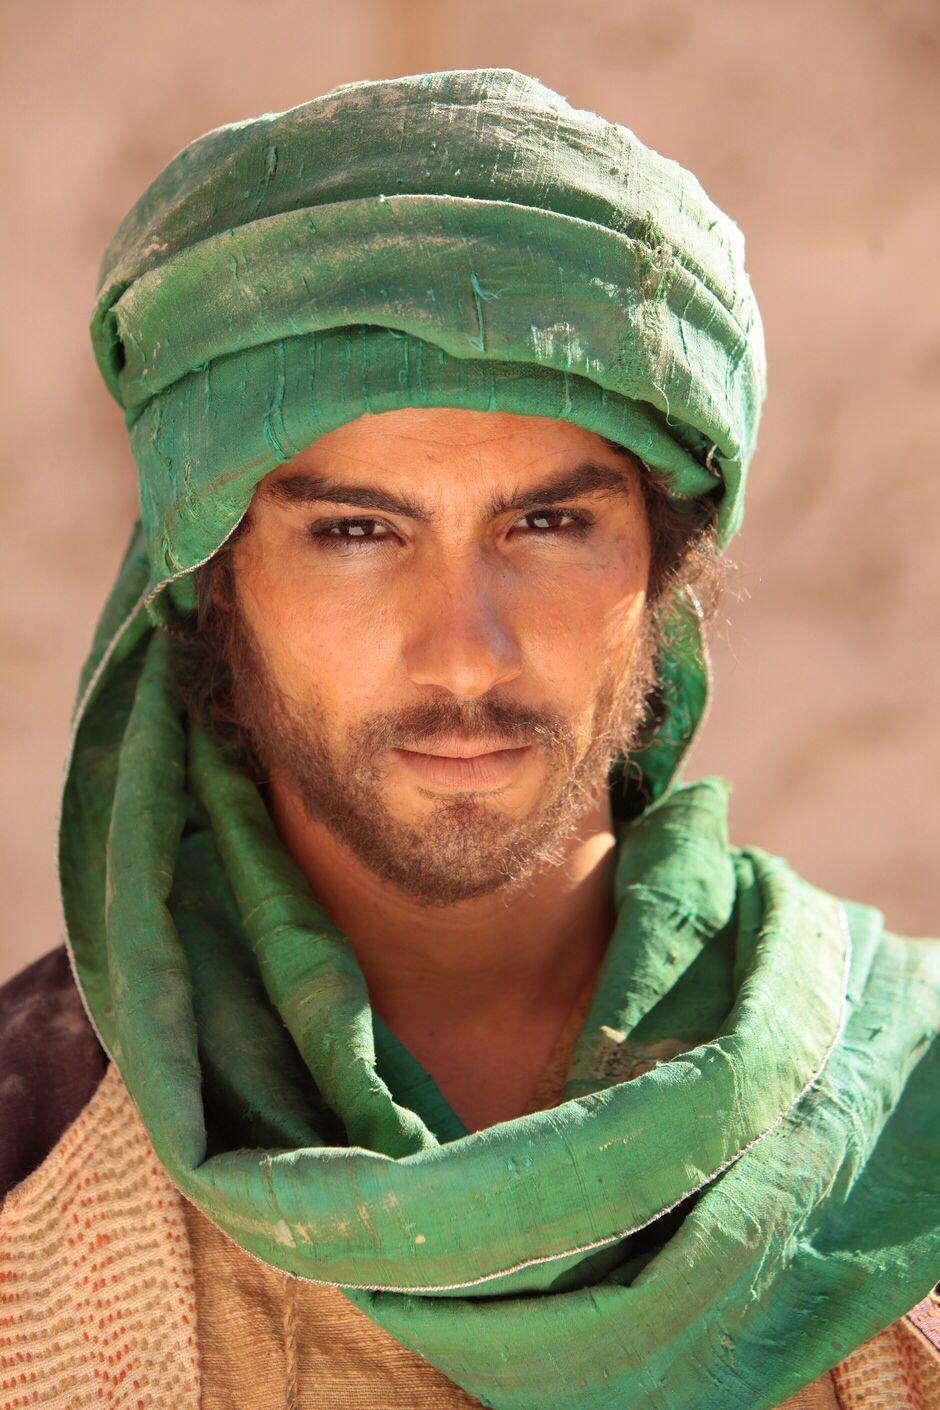 Berber | Photography poses for men, Arab men, Poses for men